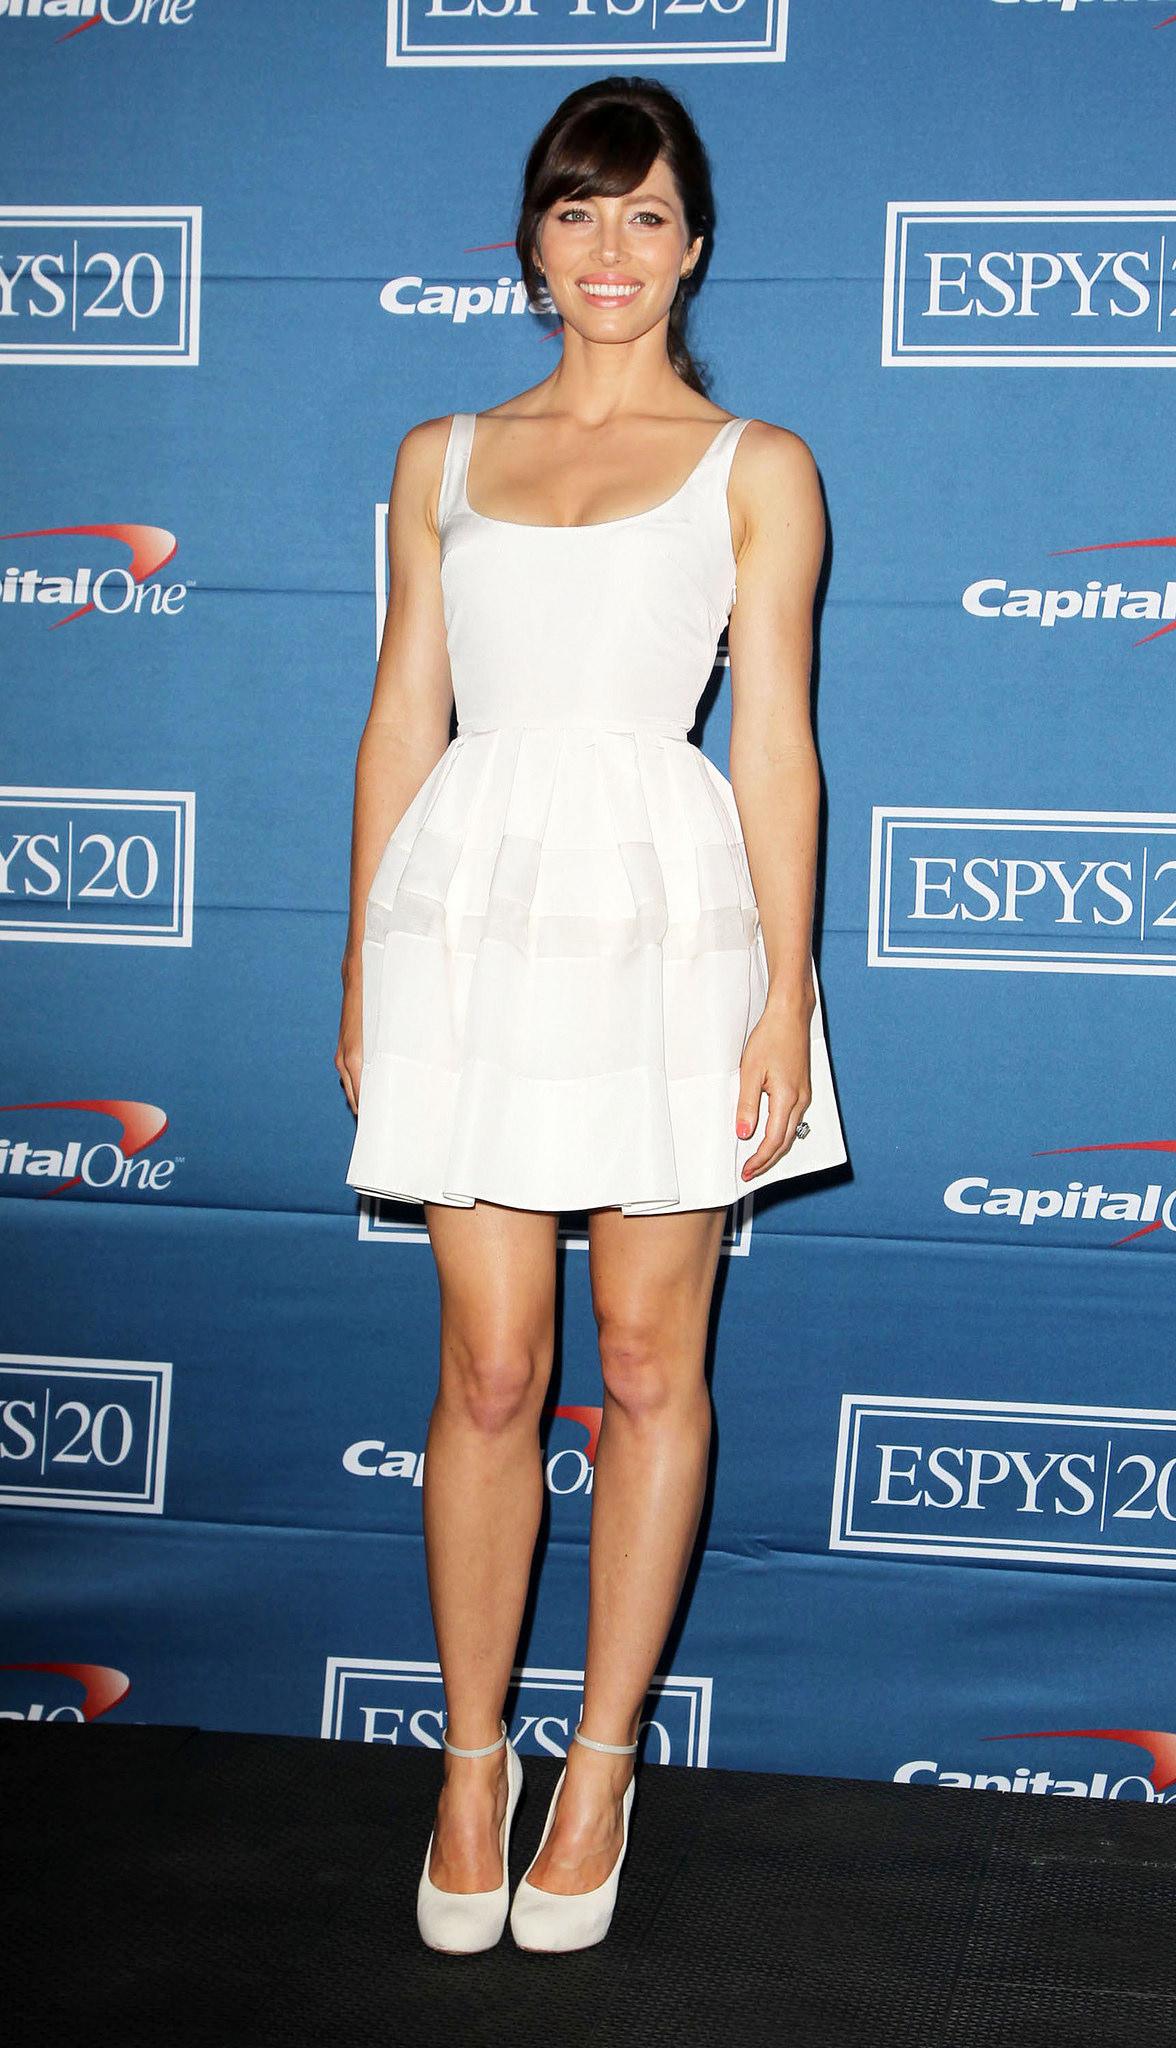 2012 ESPY Awards - Press Room